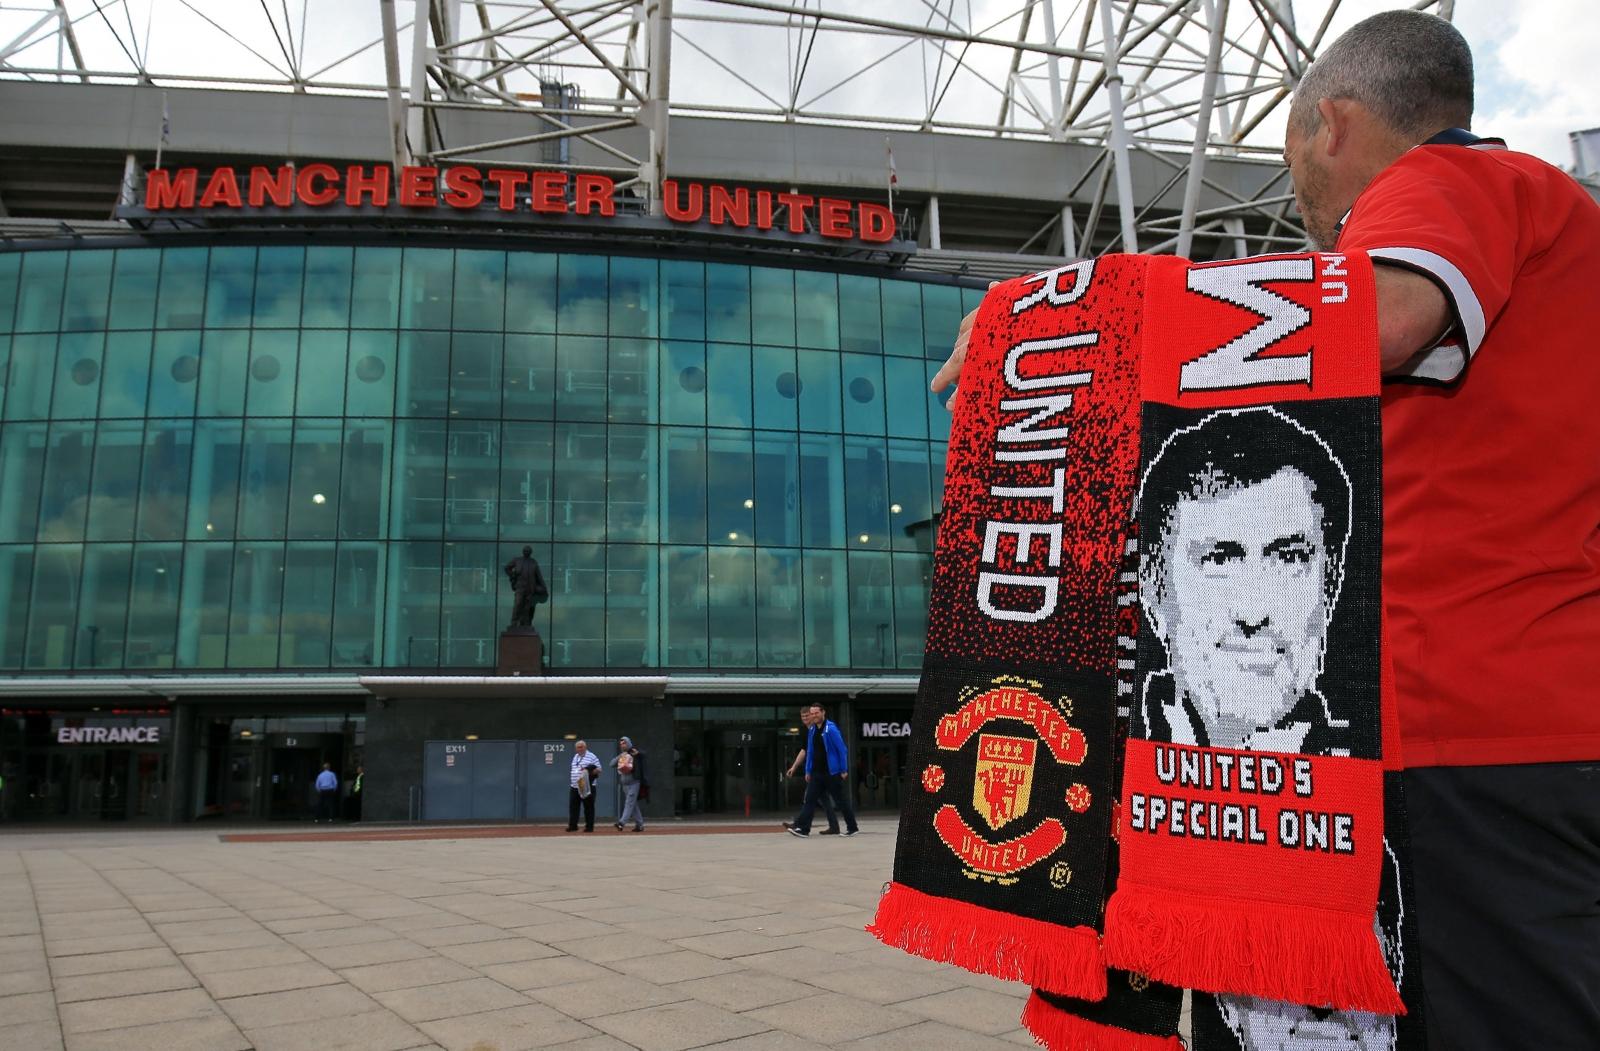 A United fan outside Old Trafford